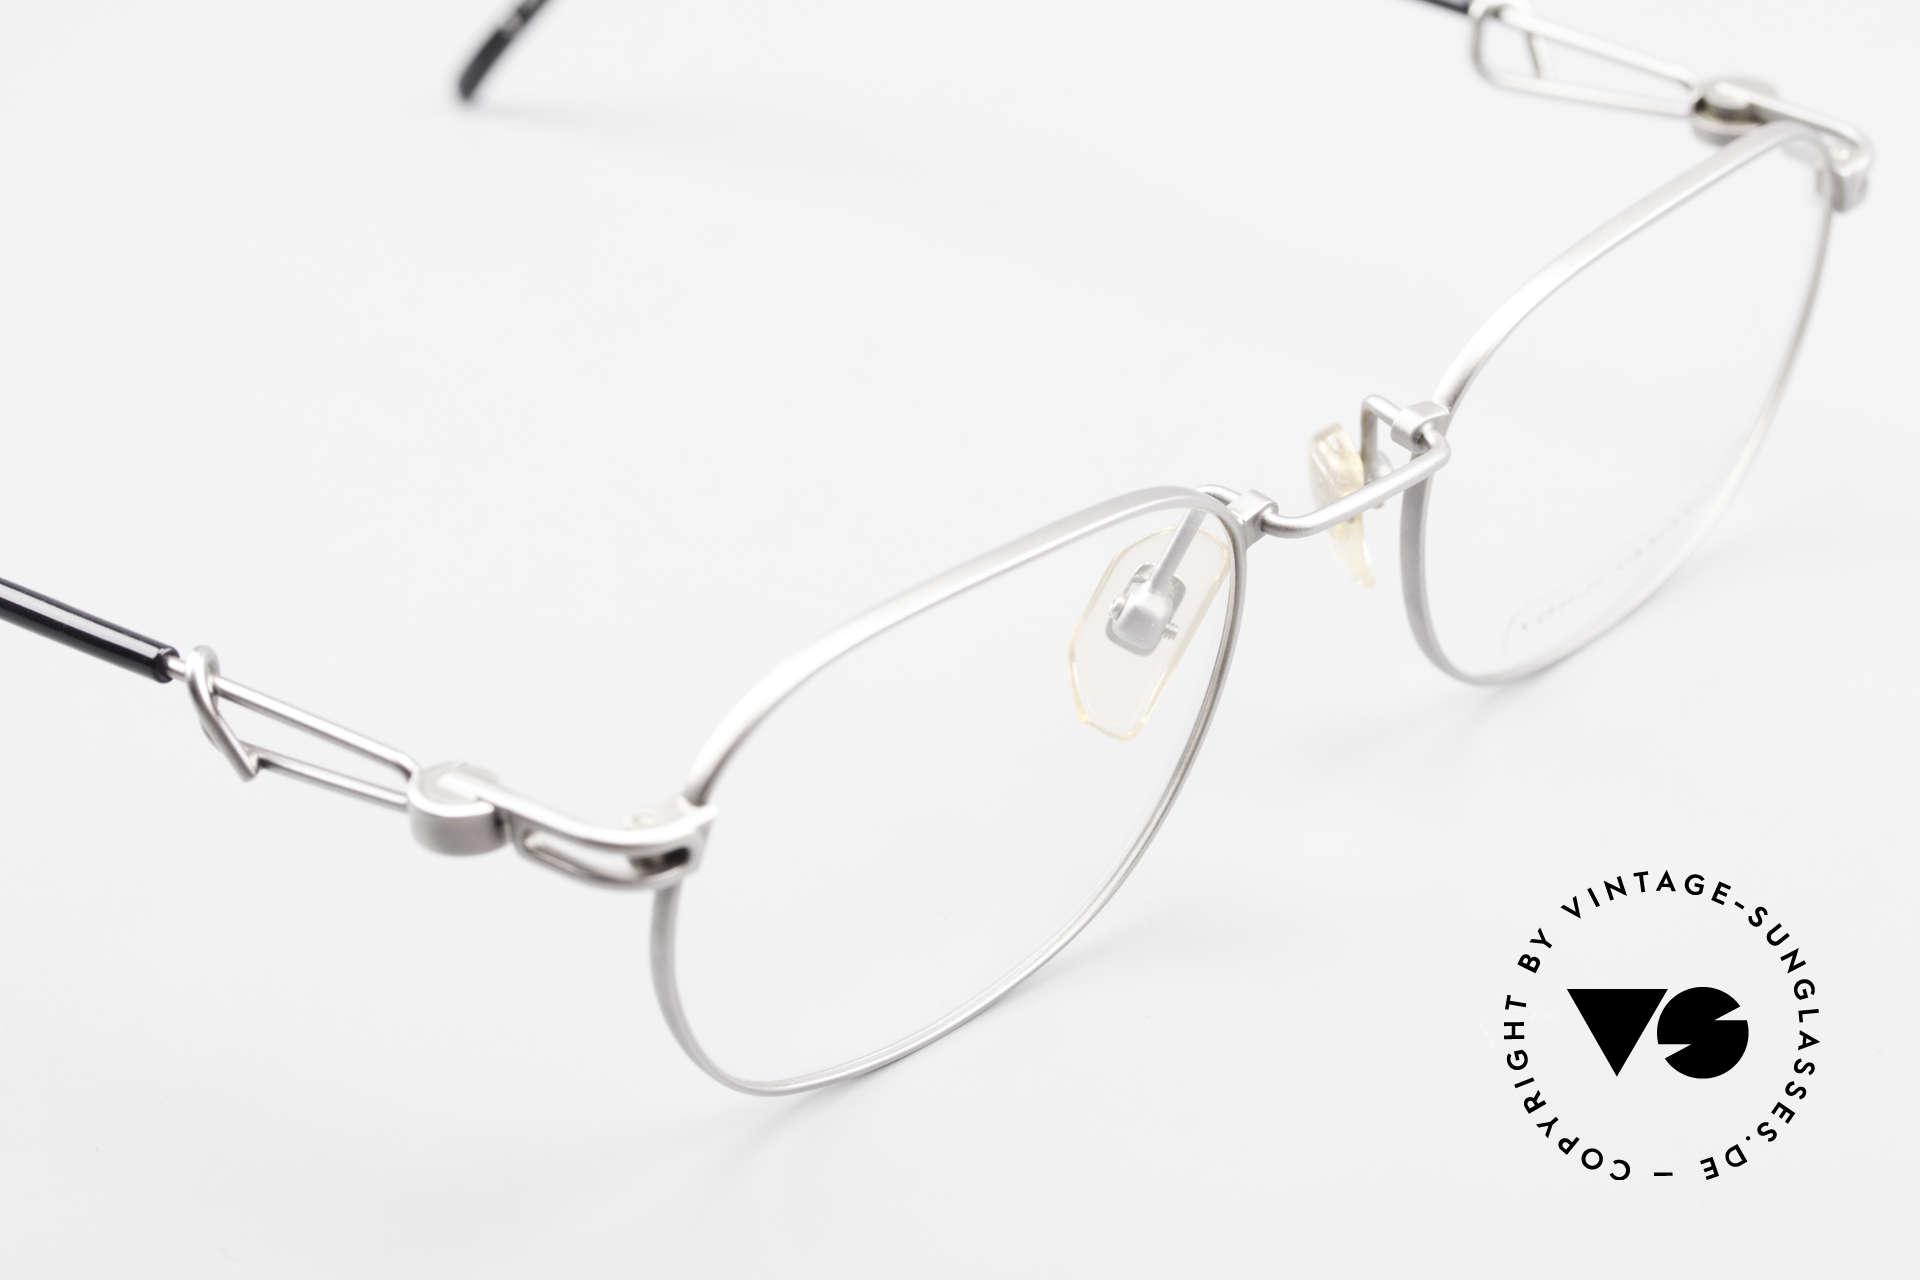 Yohji Yamamoto 51-4113 Titanium Designer Eyeglasses, DEMO lenses can be replaced with optical (sun) lenses, Made for Men and Women